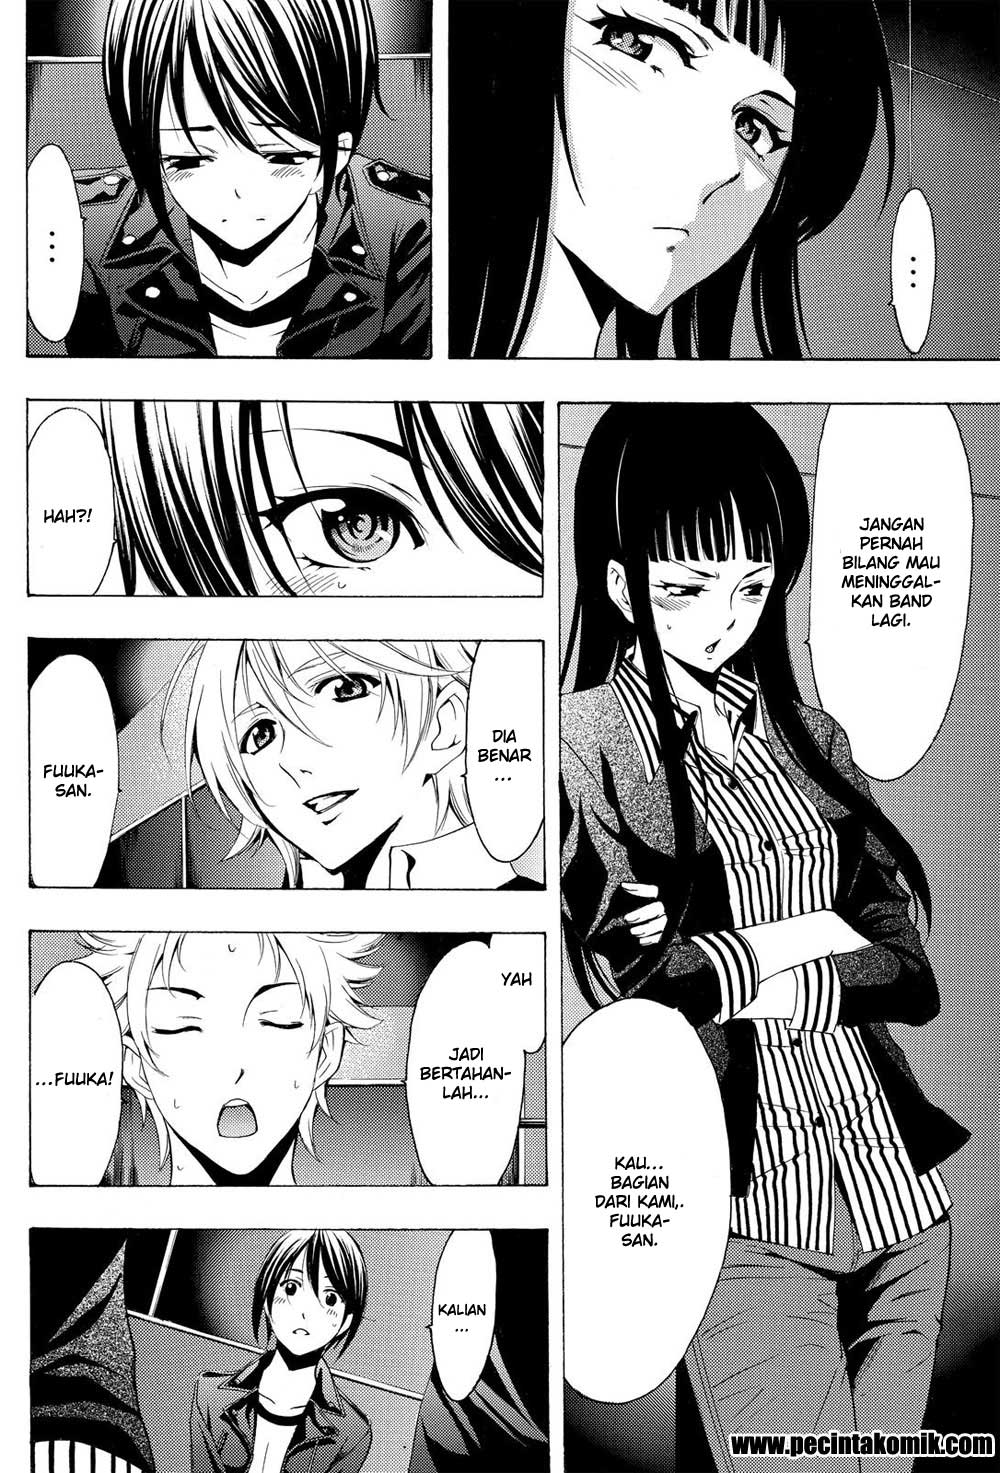 Fuuka Chapter 145-3